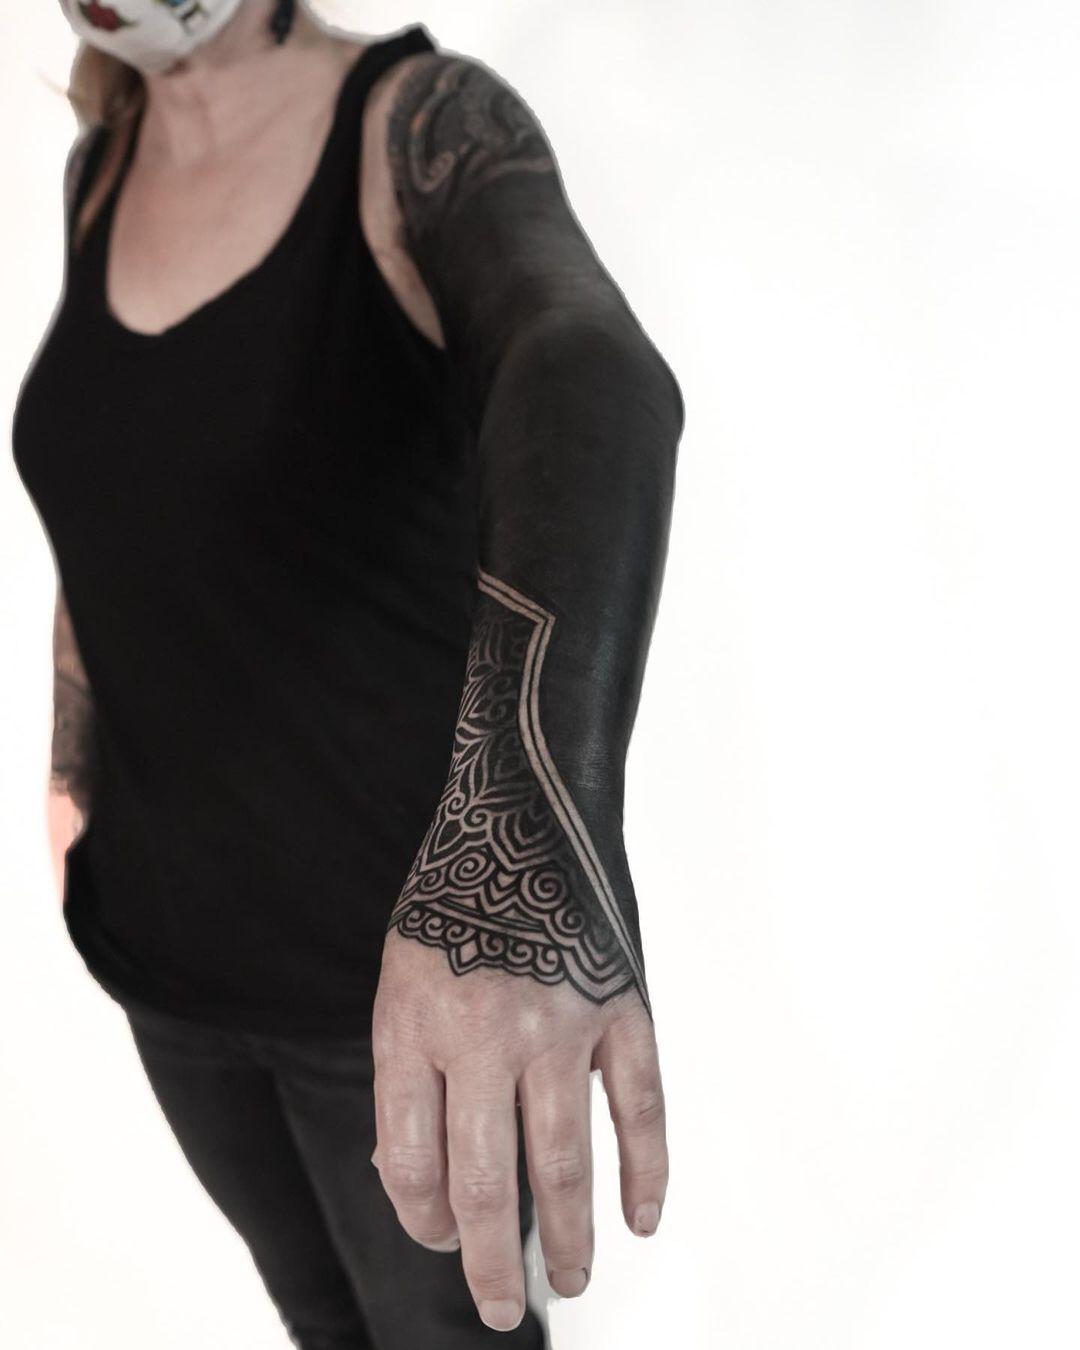 blackout-tattoos-arm-ornamental